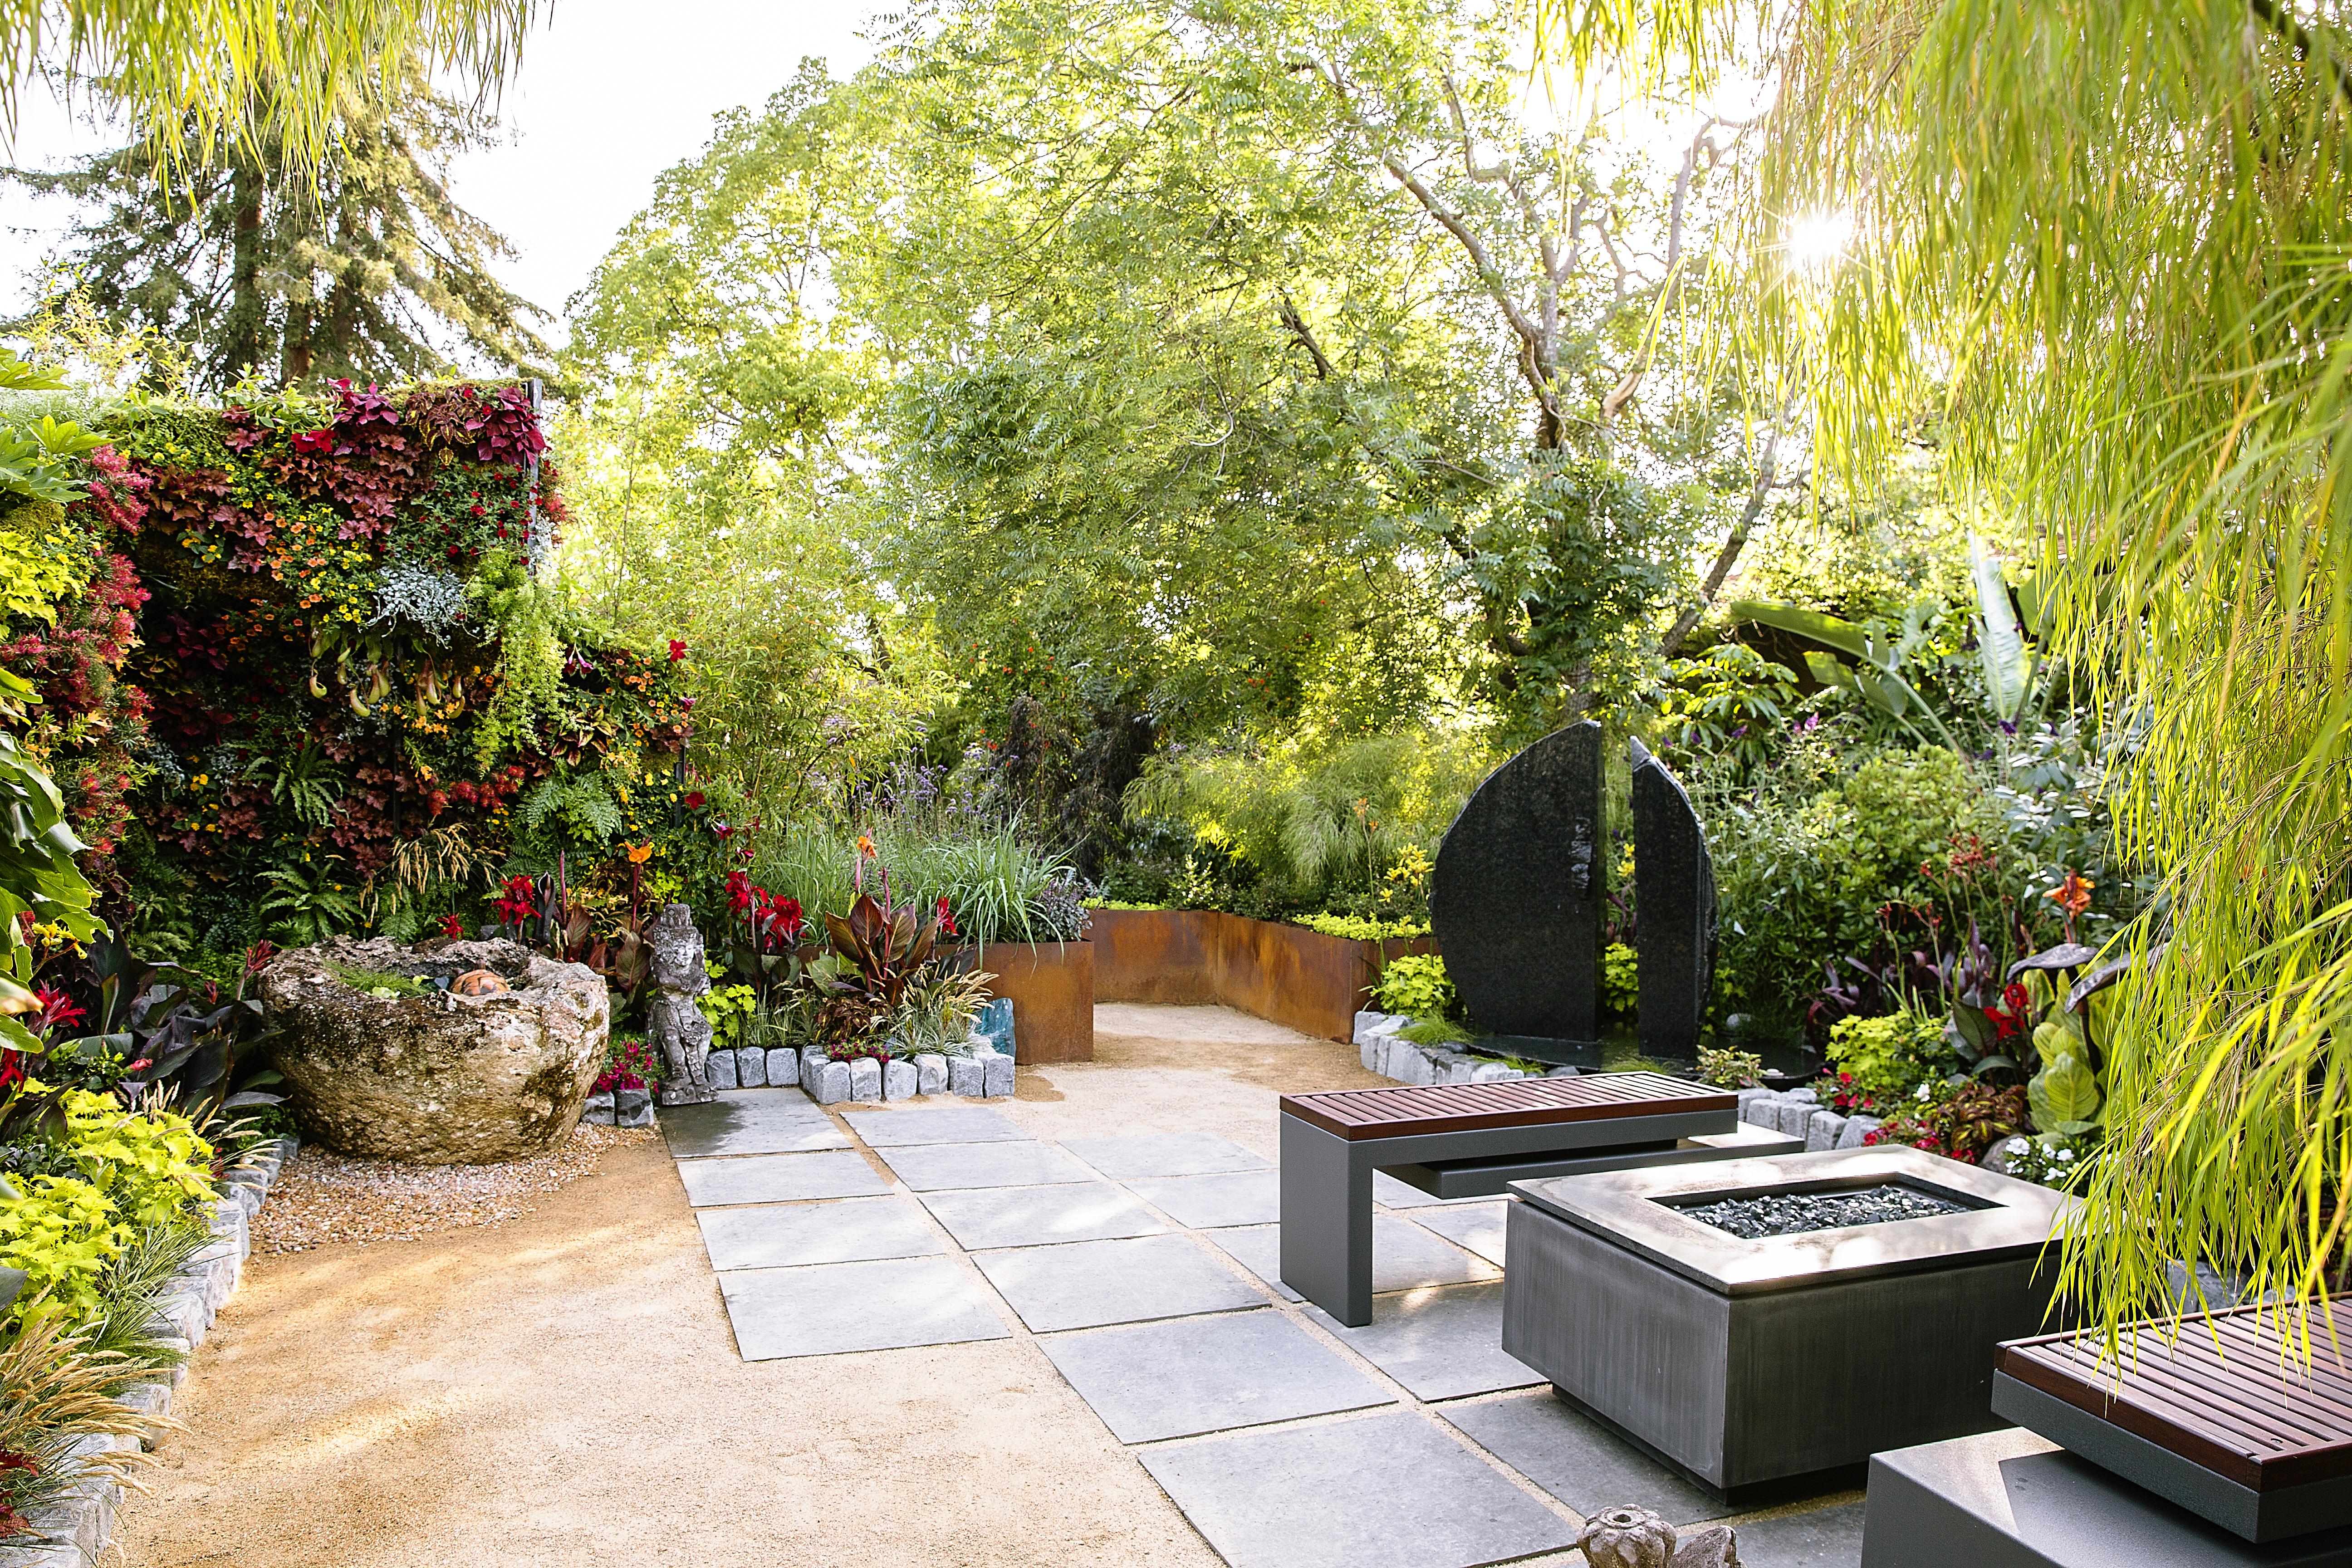 8 Ideas for a Tropical-Themed Garden - Sunset Magazine